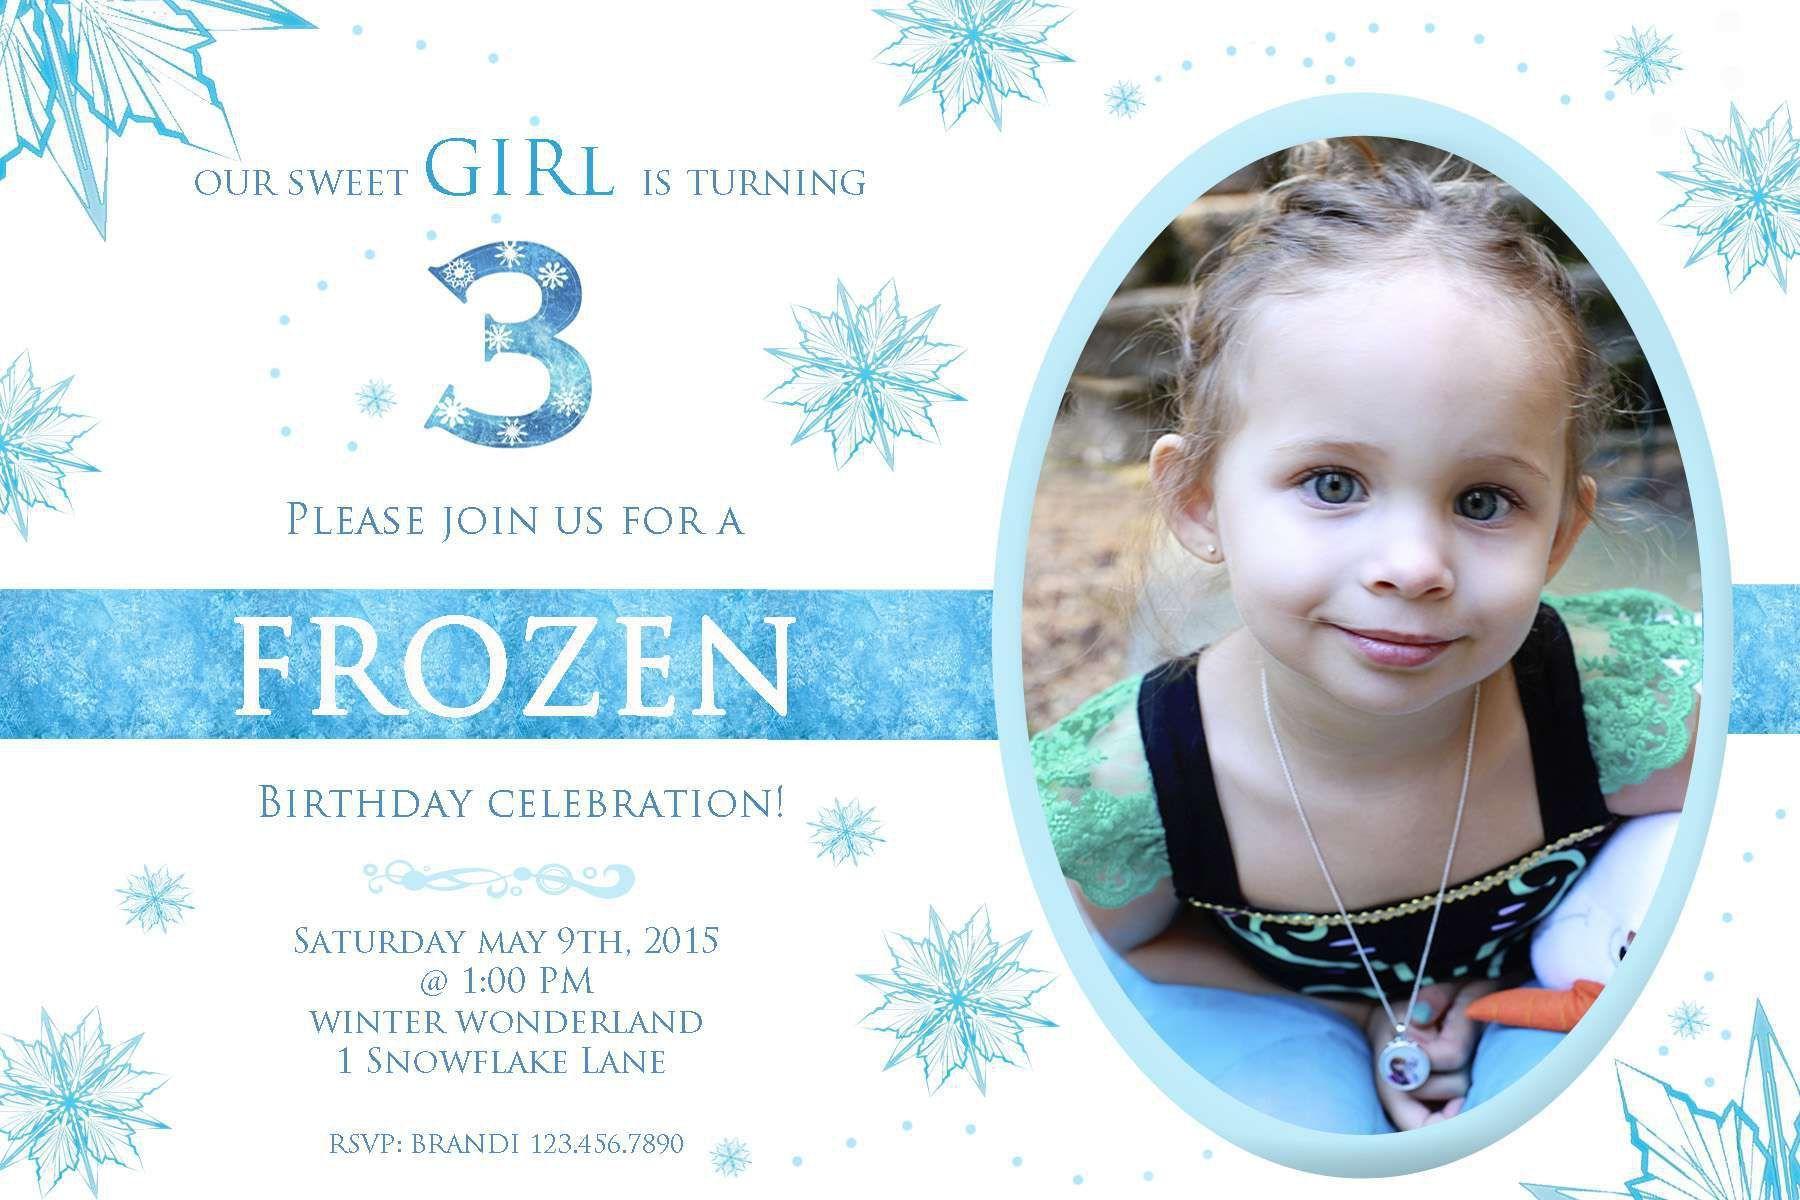 birthday invitation : frozen birthday invitations - Free Invitation ...